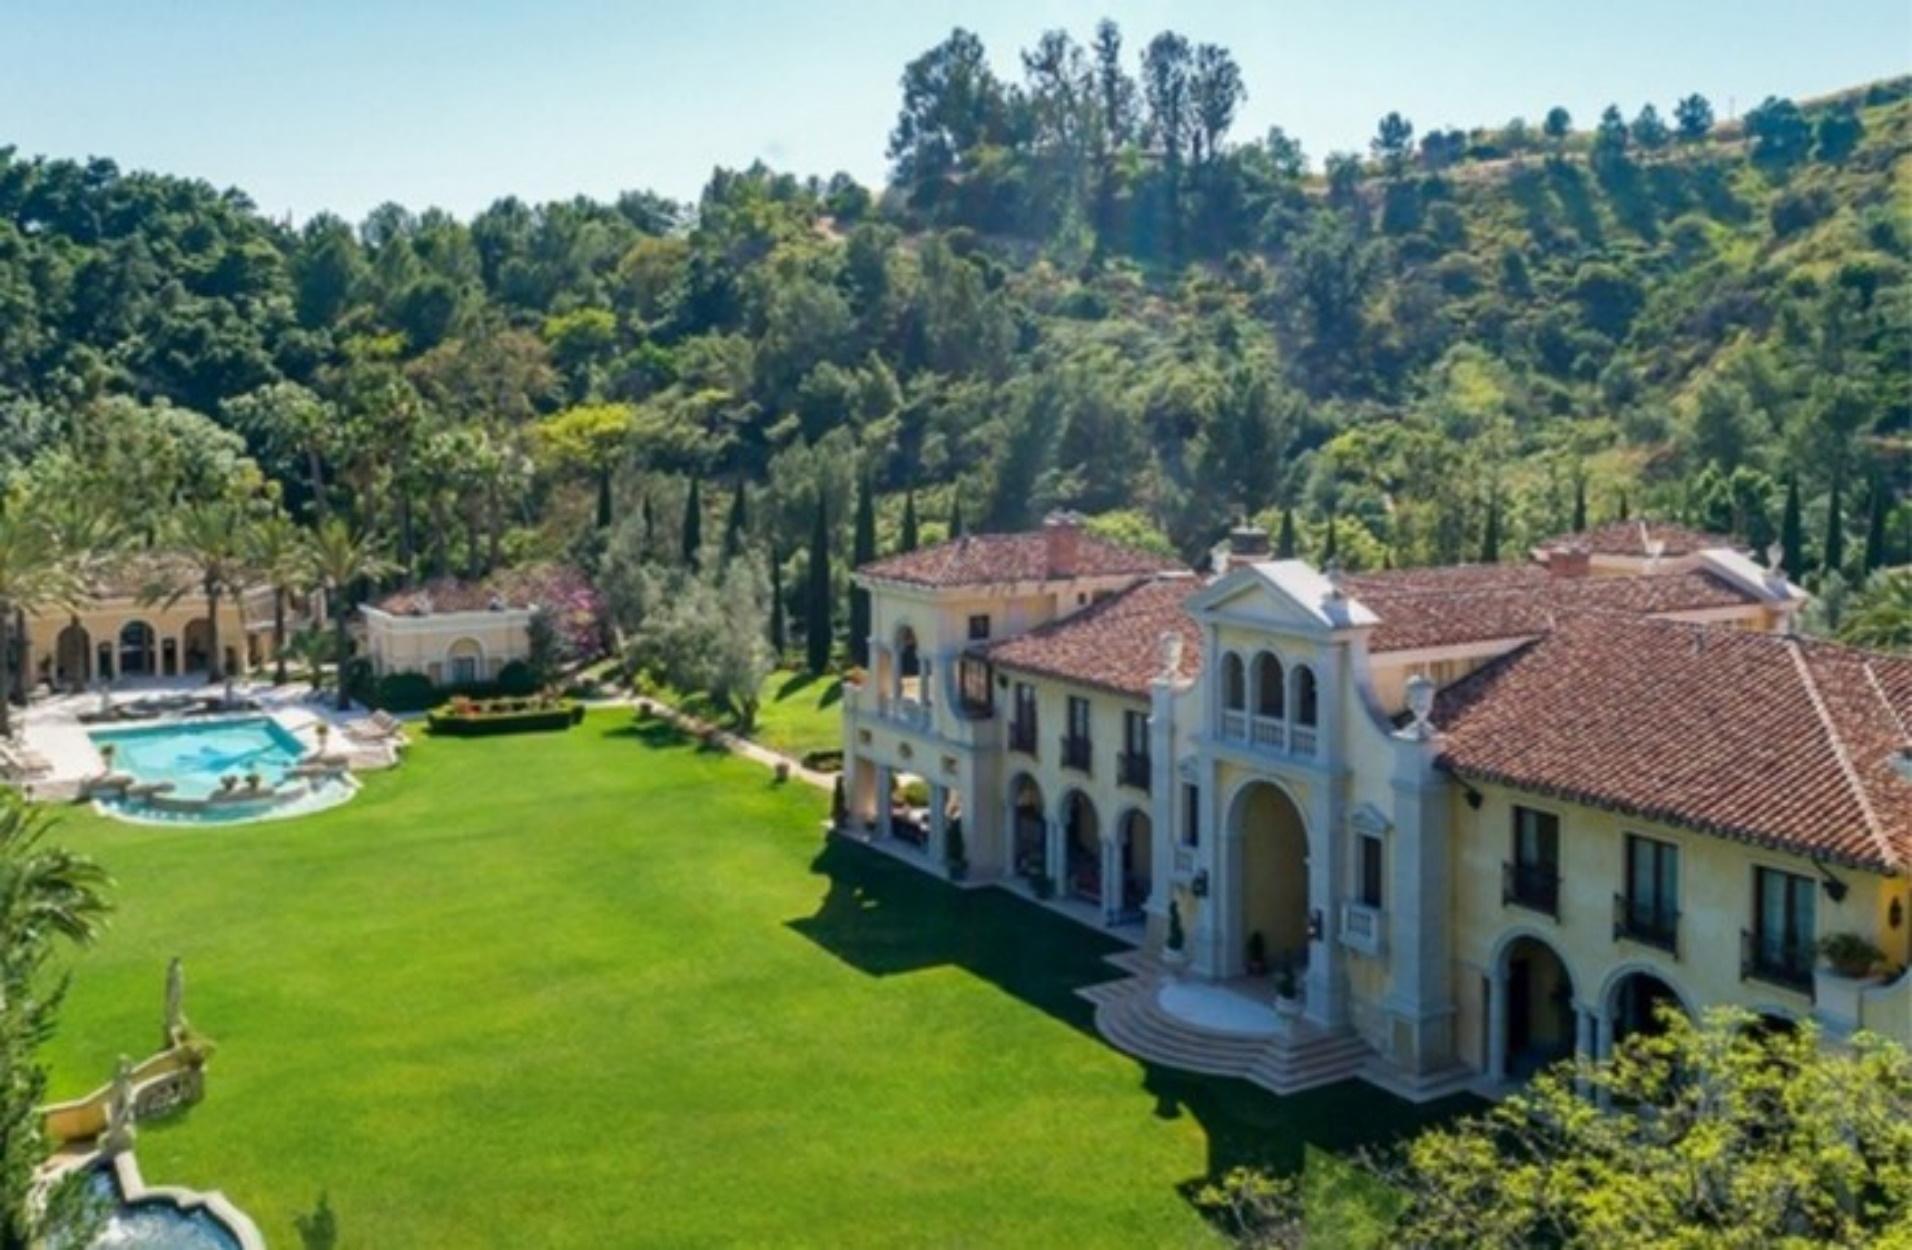 Villa Firenze: Μια από τις πιο ακριβές κατοικίες στον κόσμο αυτή την στιγμή